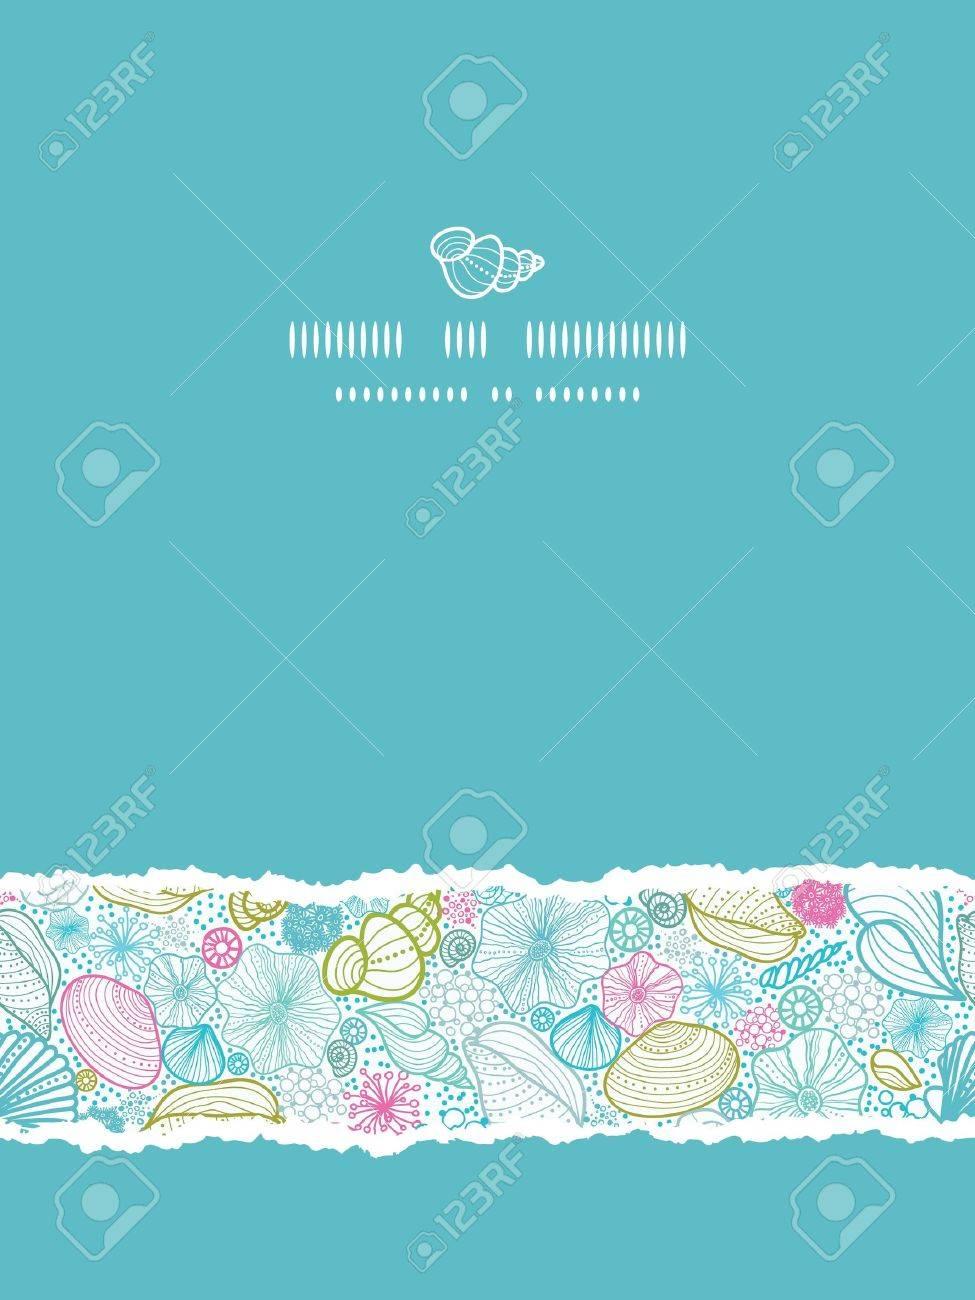 Seashells line art vertical torn seamless pattern background - 18433365